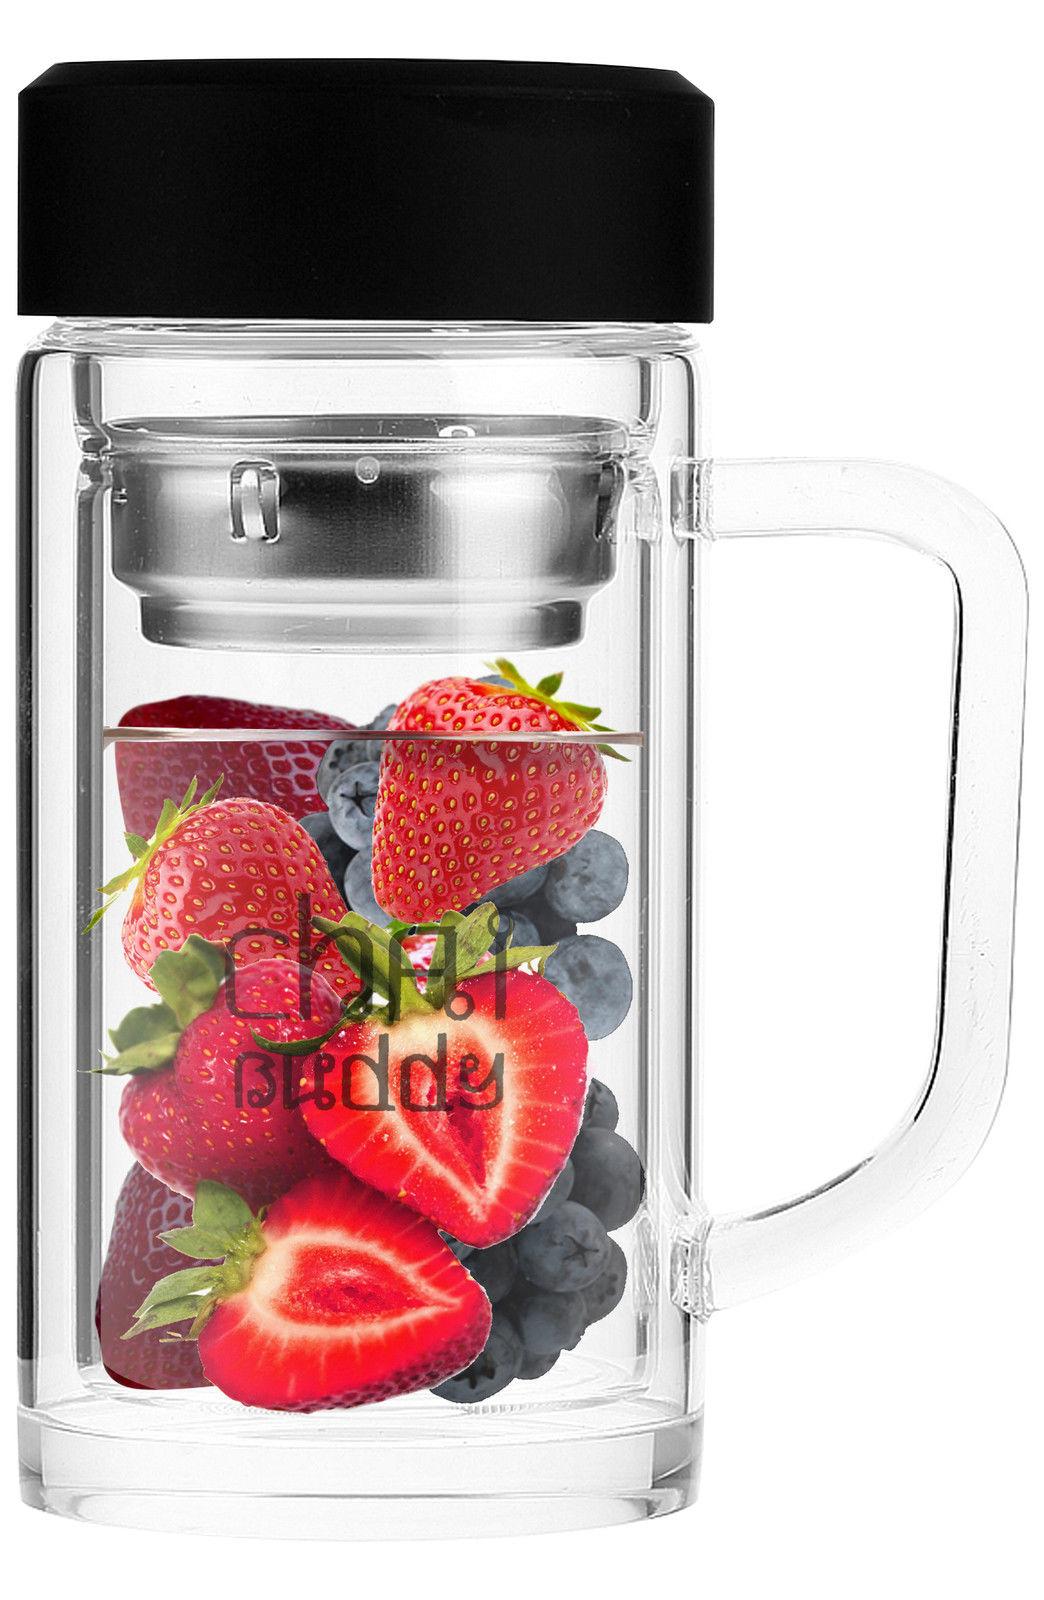 350ml 12 fl oz chai buddy infuser glass bottle fruit tea mug thermos travel. Black Bedroom Furniture Sets. Home Design Ideas